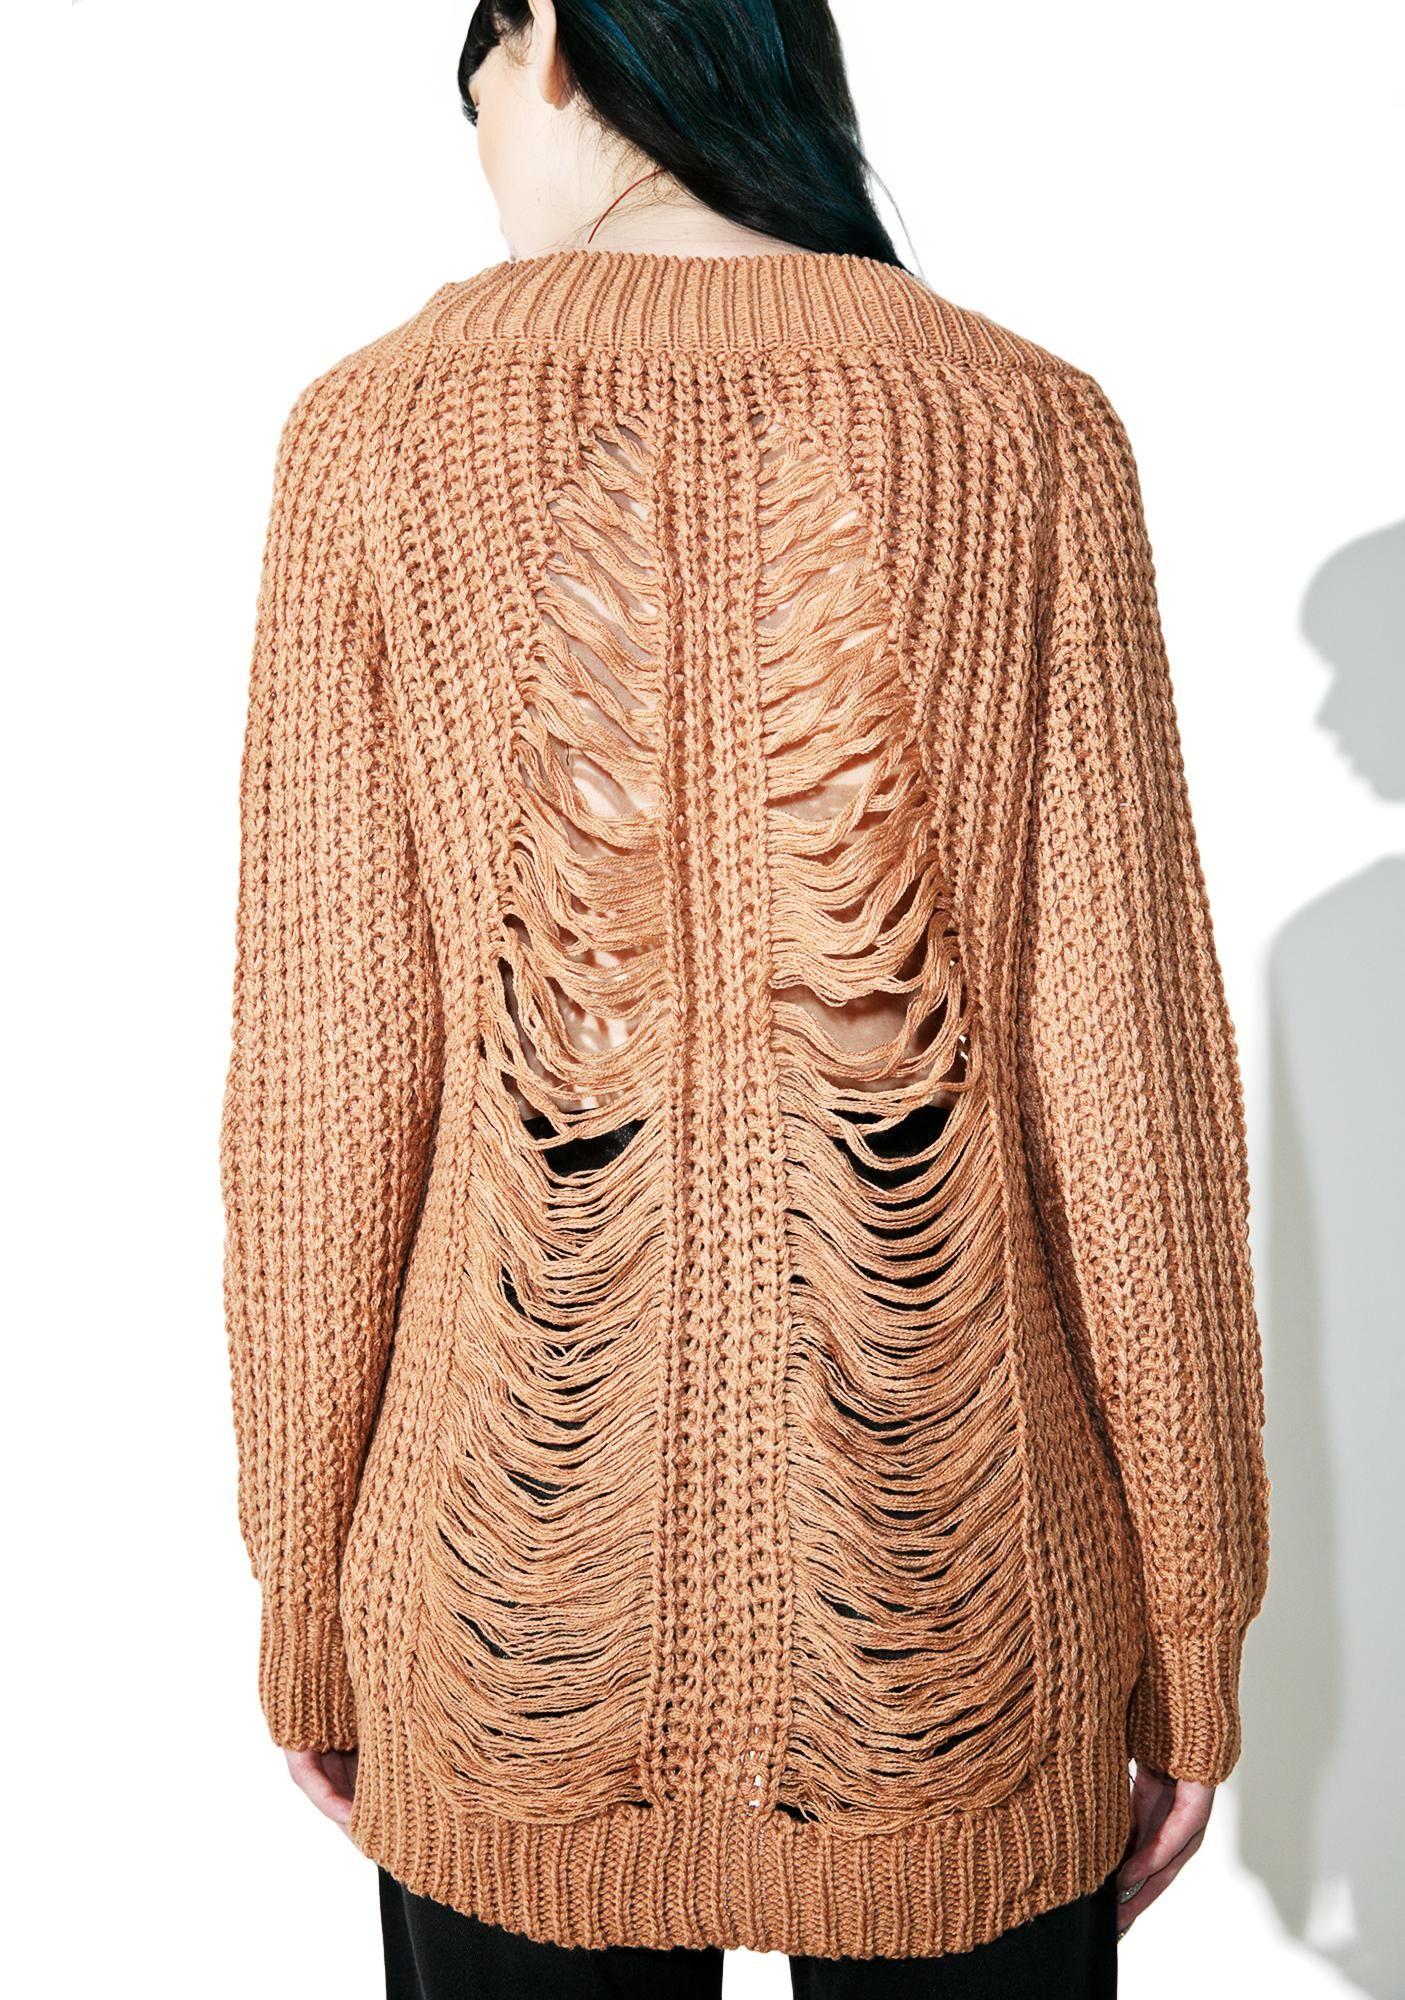 Salted Caramel Shredded Sweater | Light browns, Streetwear ...